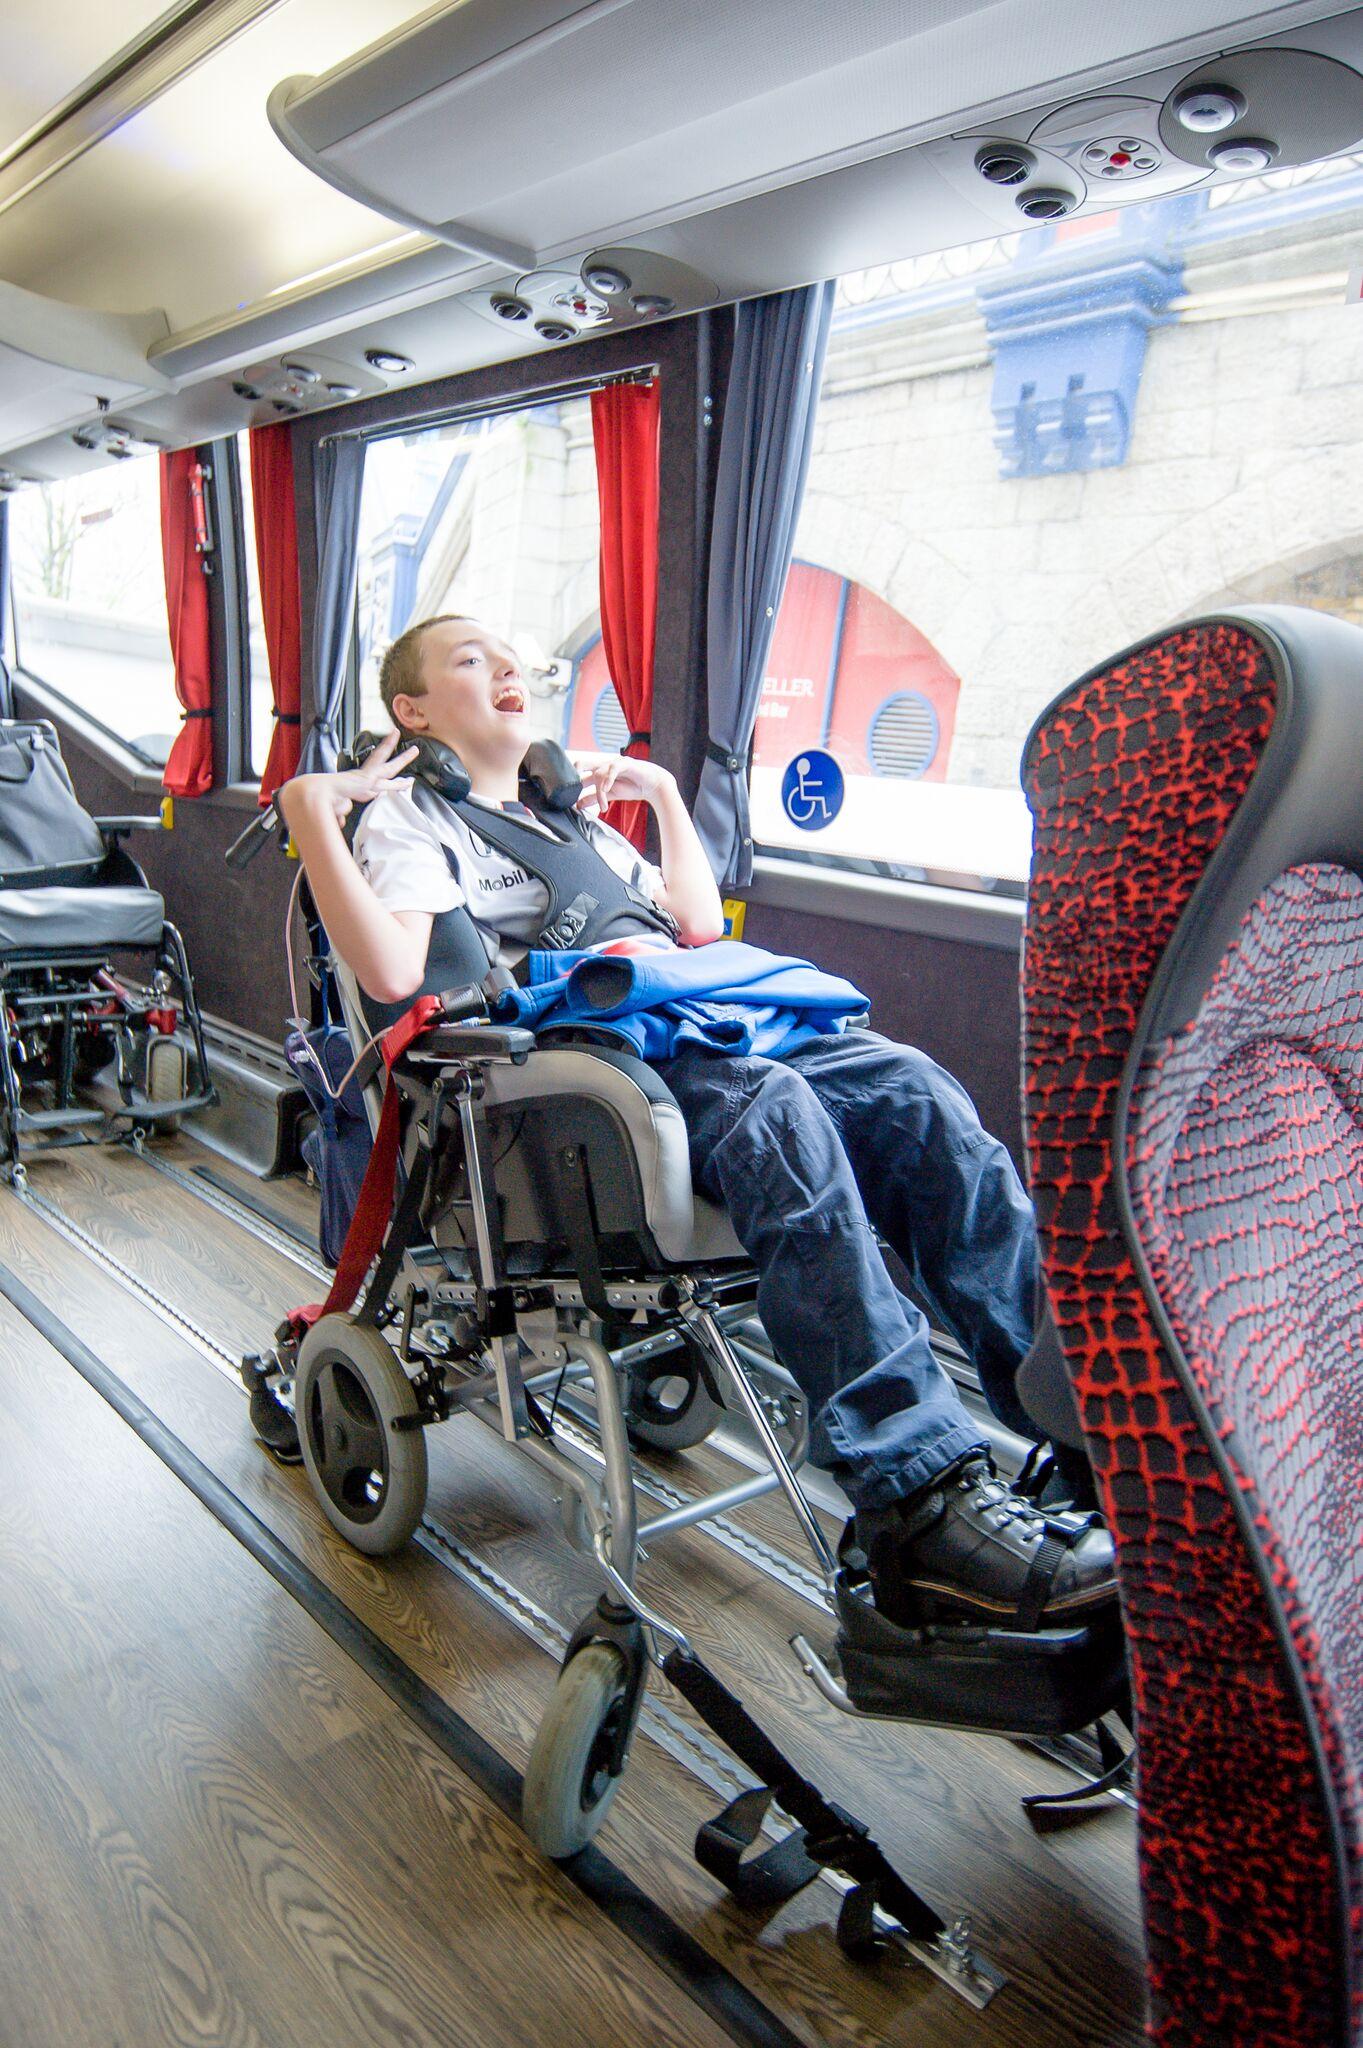 interior of an accessible coach